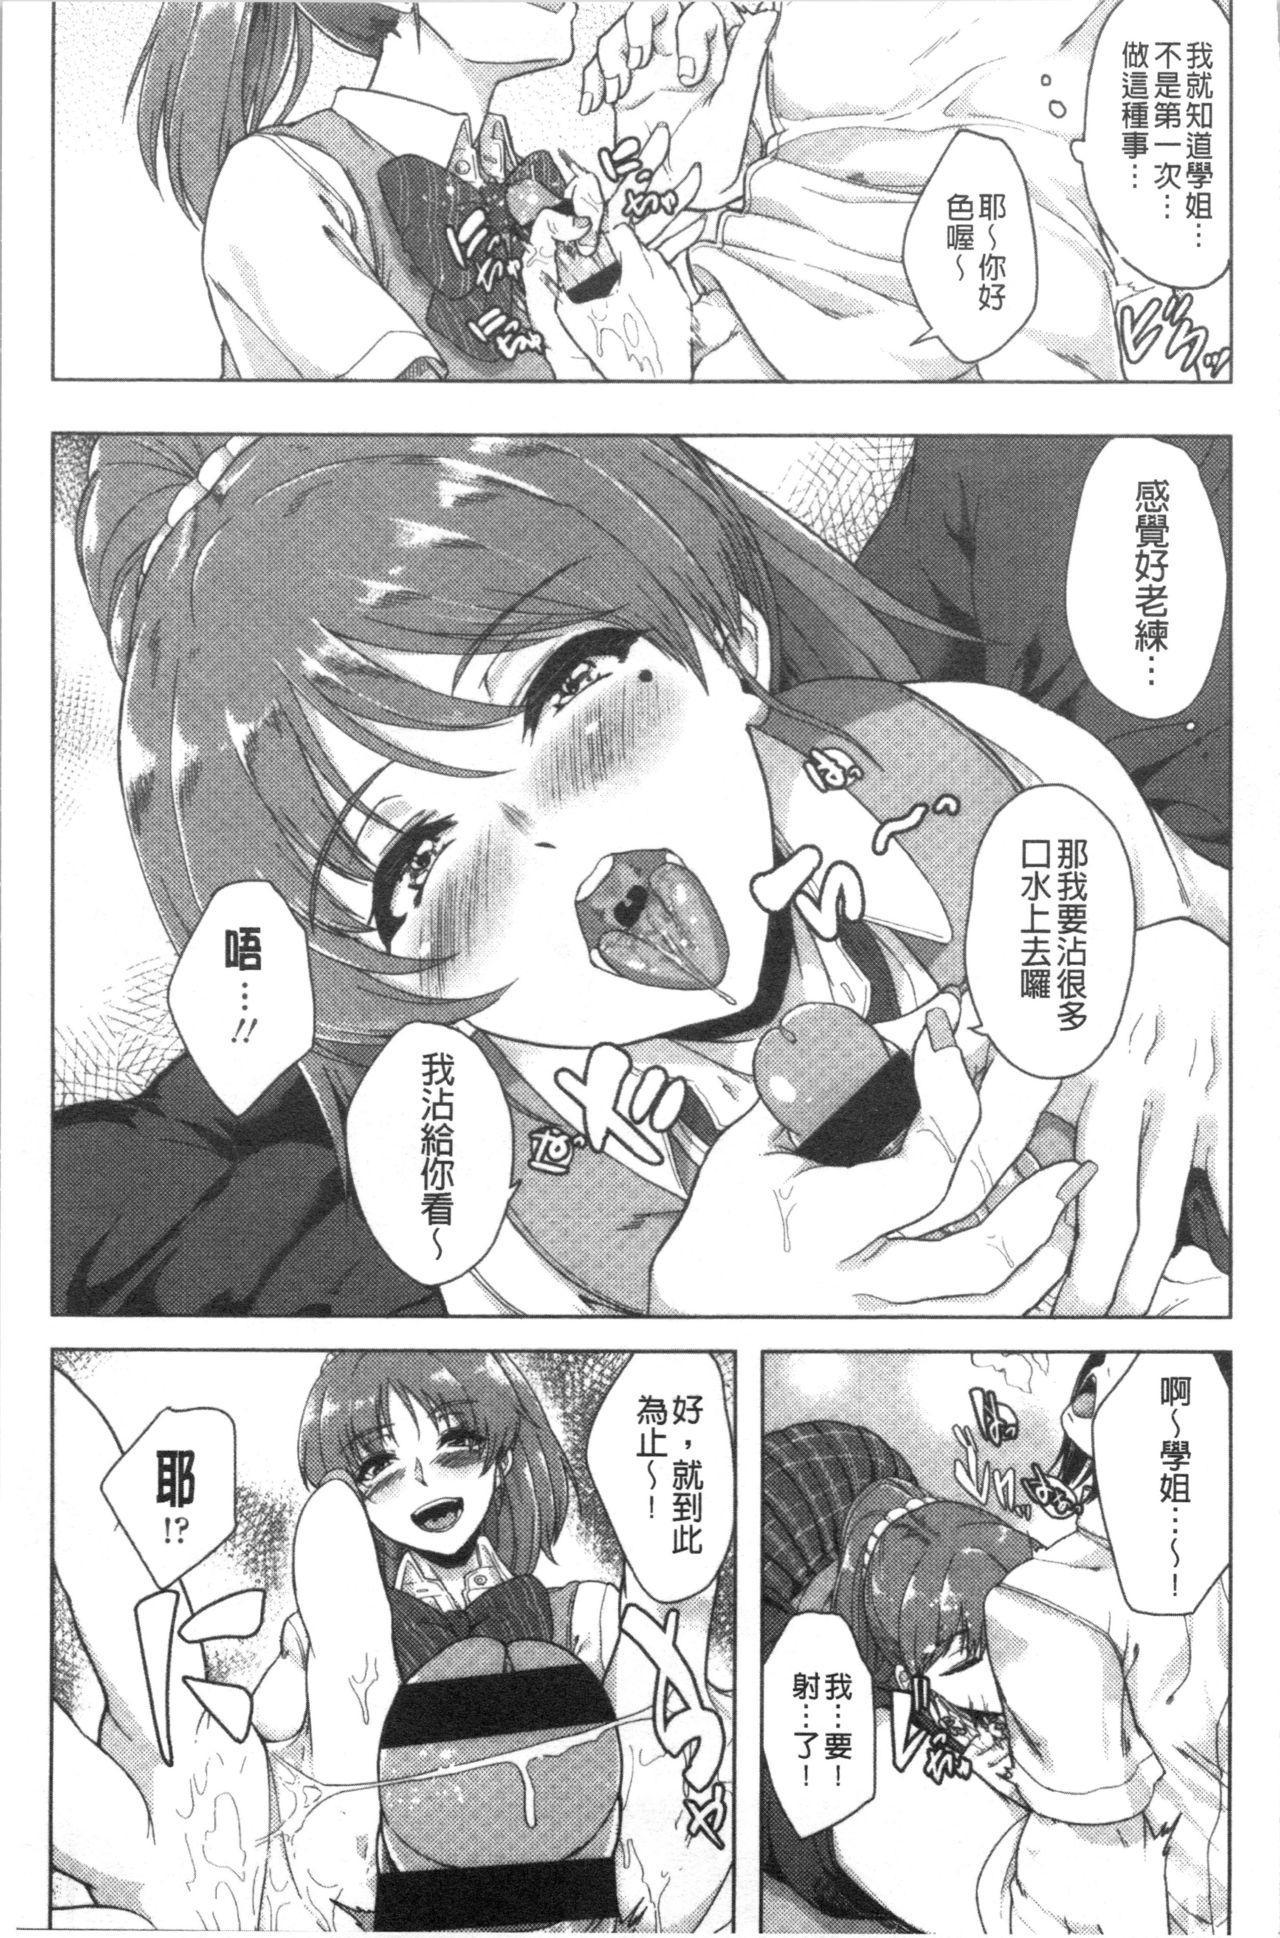 Kanojo ga SEX ni nare teru wake | 女友對激情性愛變很習慣的理由 11